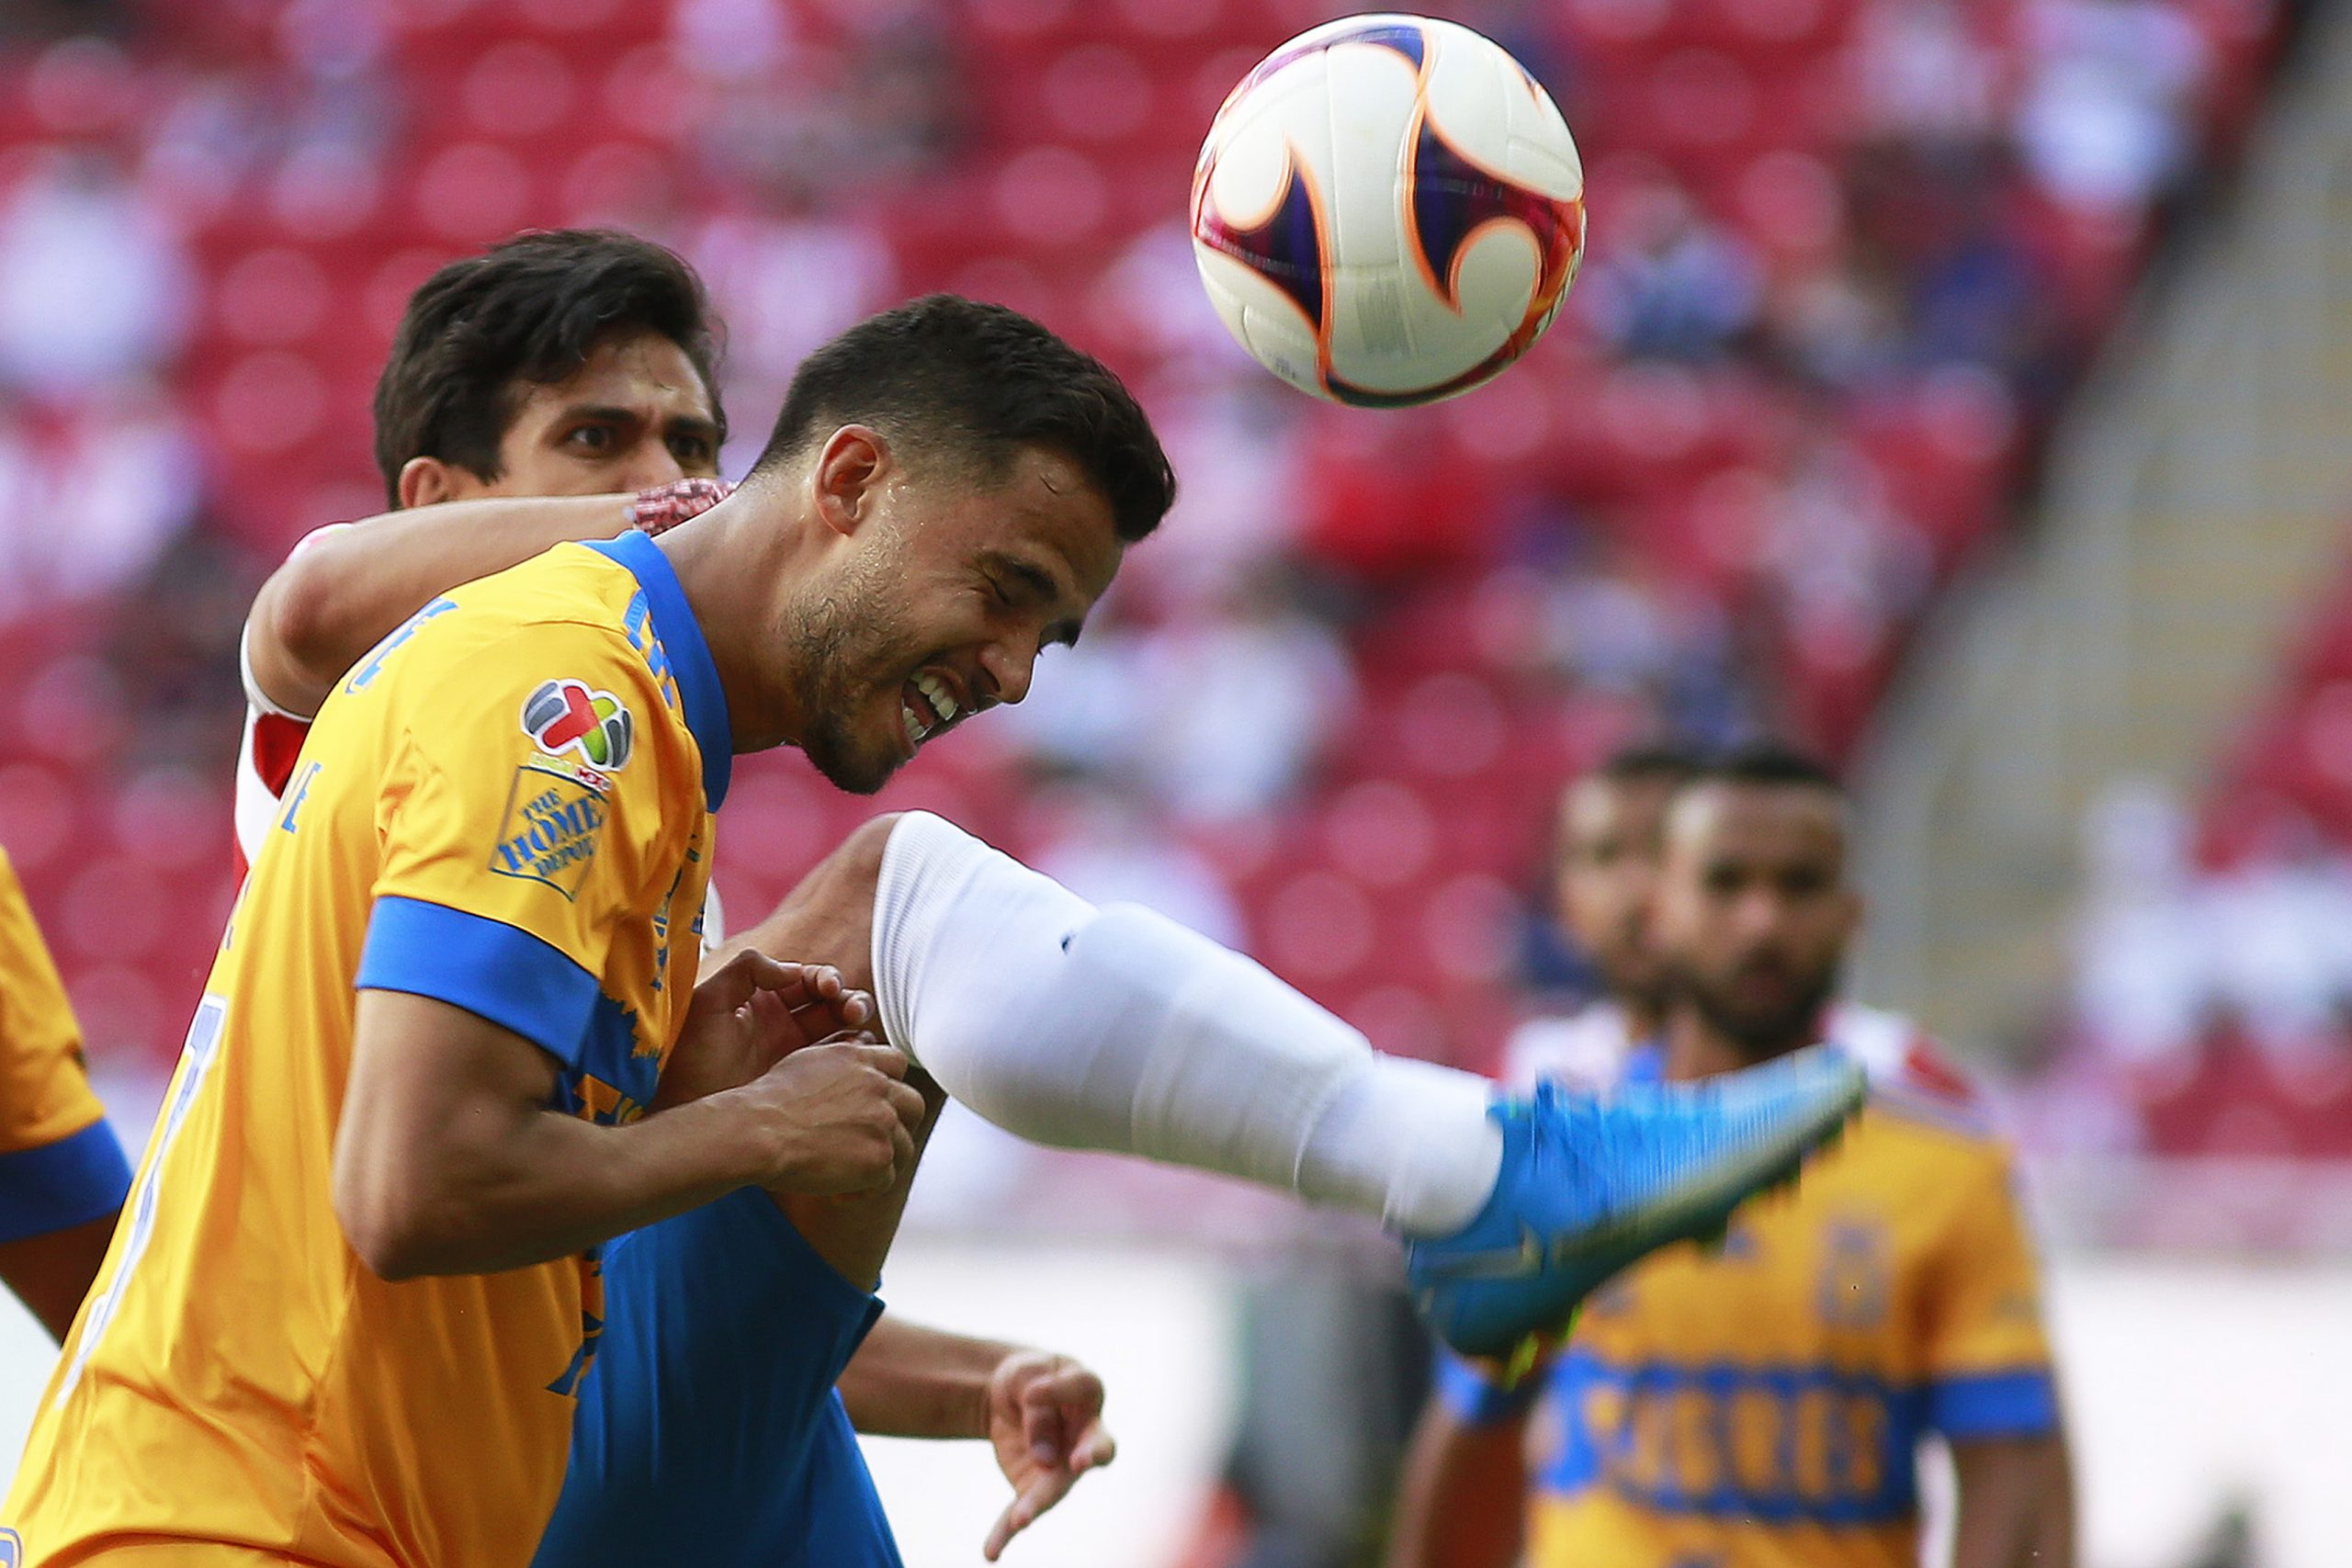 Tigres UANL and Chivas de Guadalajara are two of the Liga MX teams featuring in a slew of preseason matches in San Antonio this week.